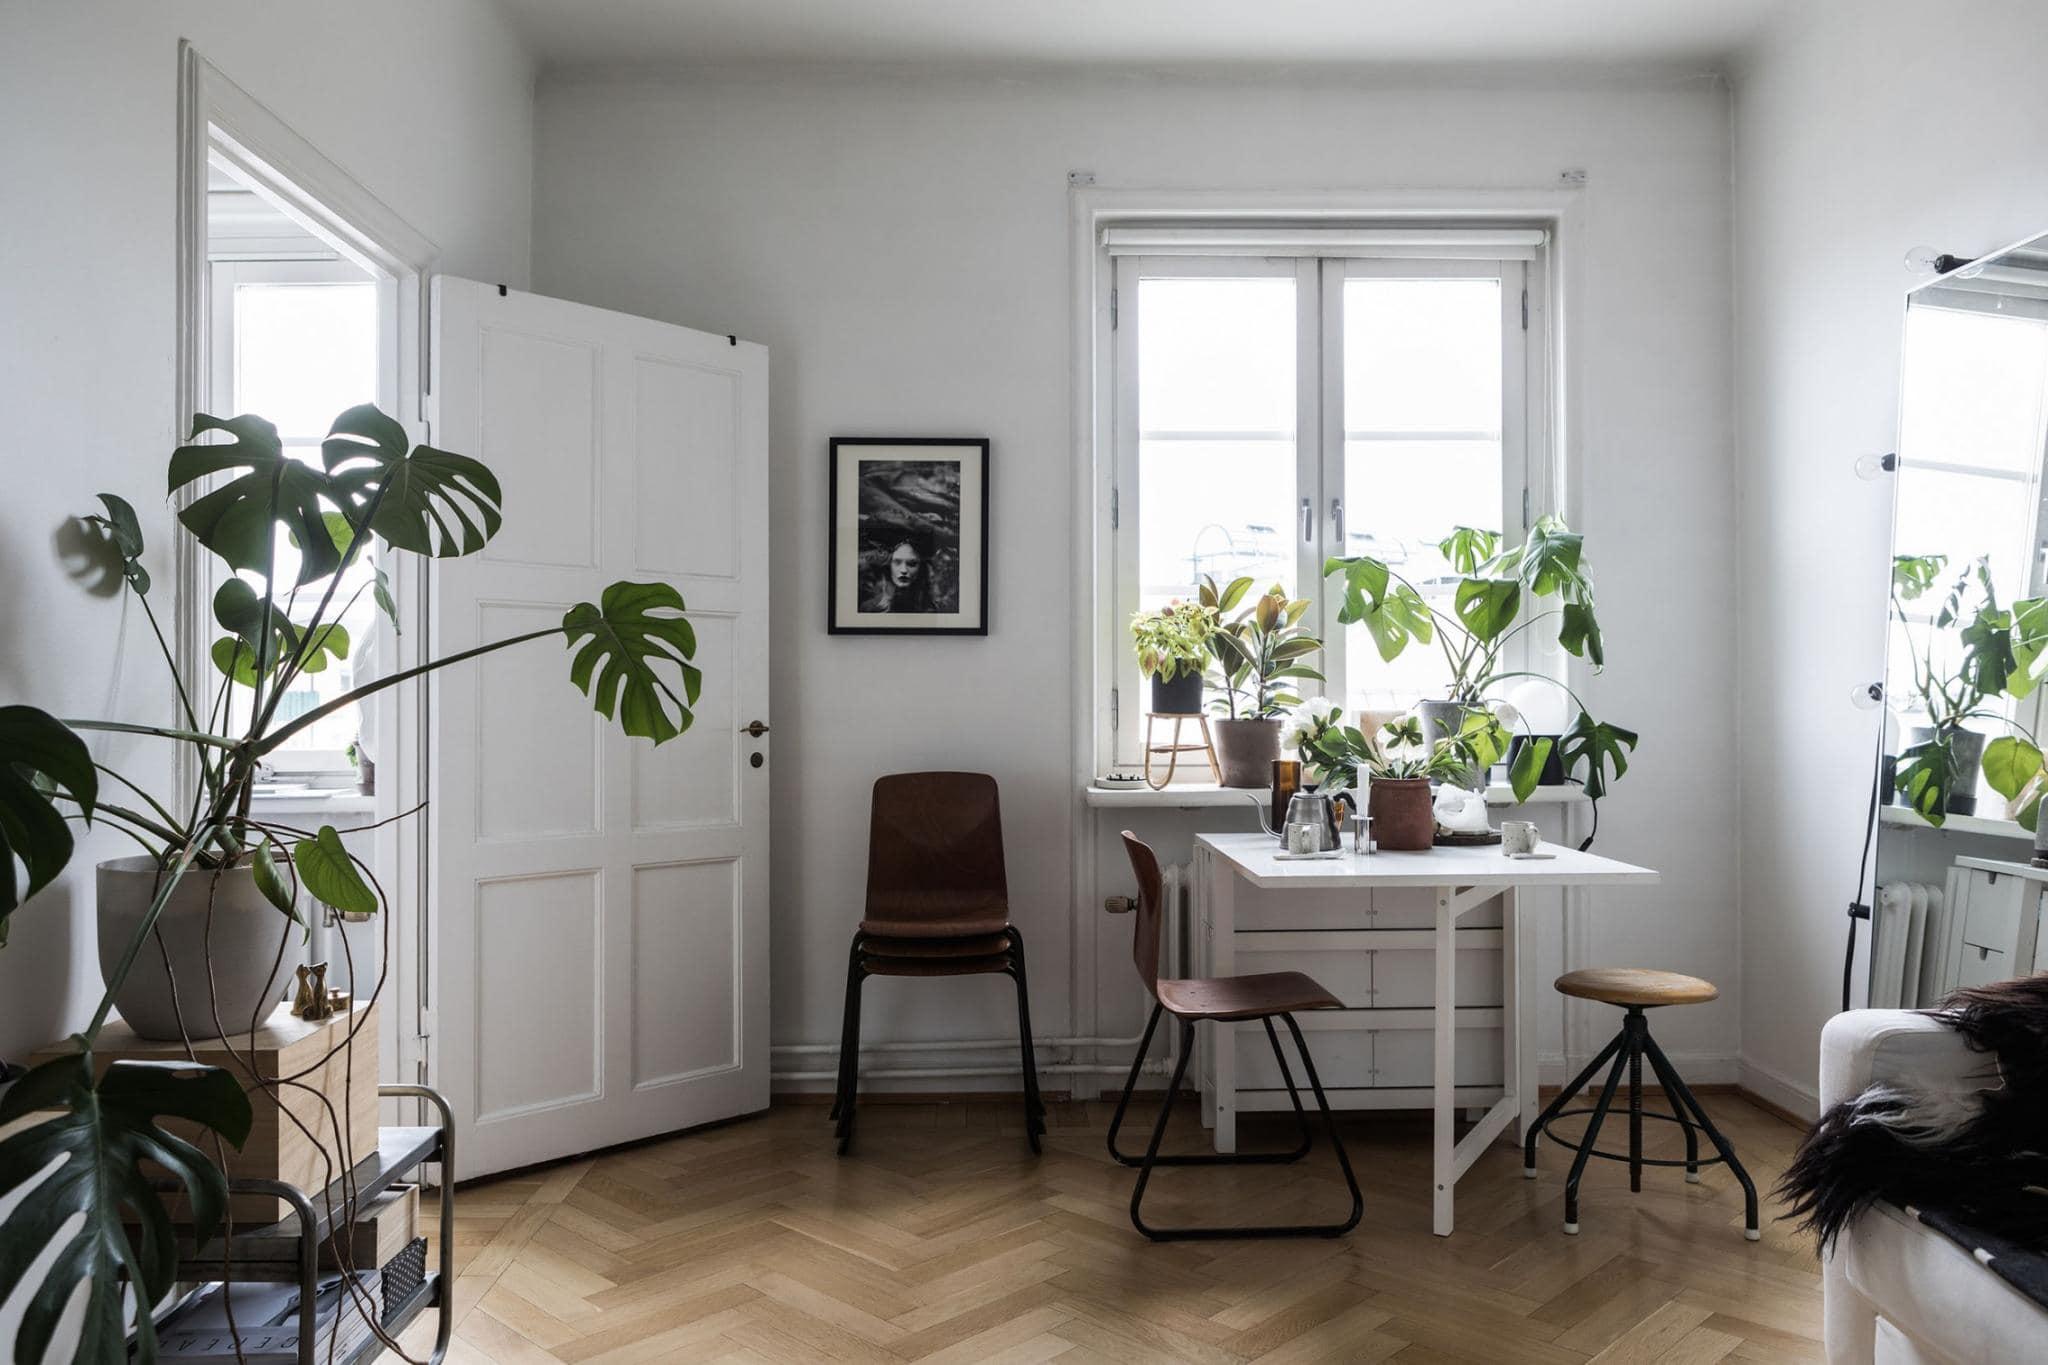 Green living space coco lapine designcoco lapine design for Interieur 050